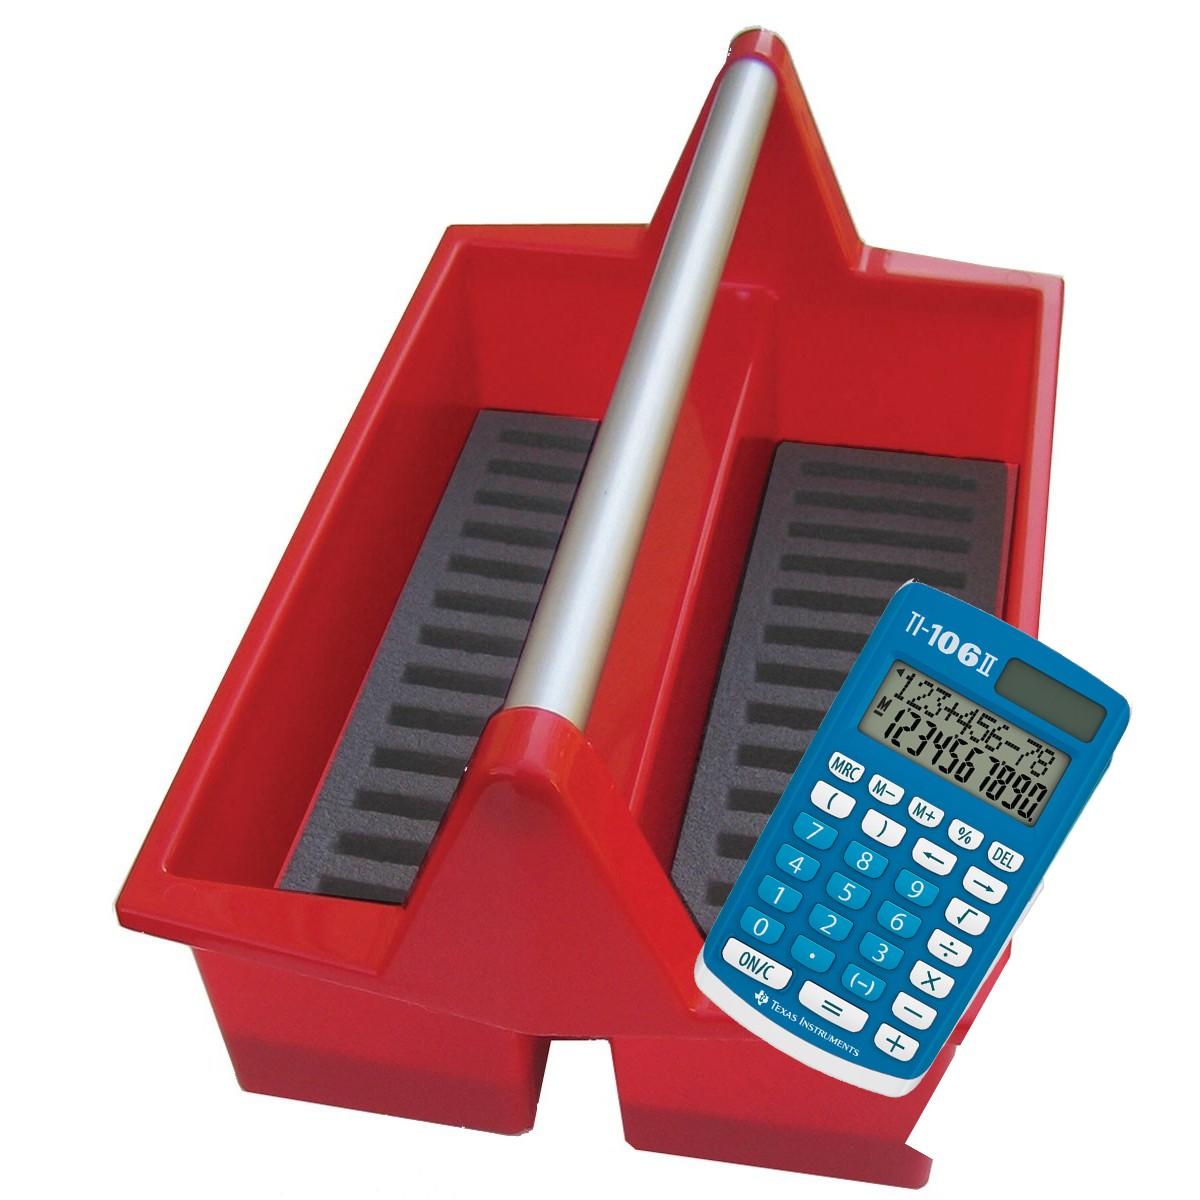 Miniräknare TI-106 II, Texas - solcell 30-pack